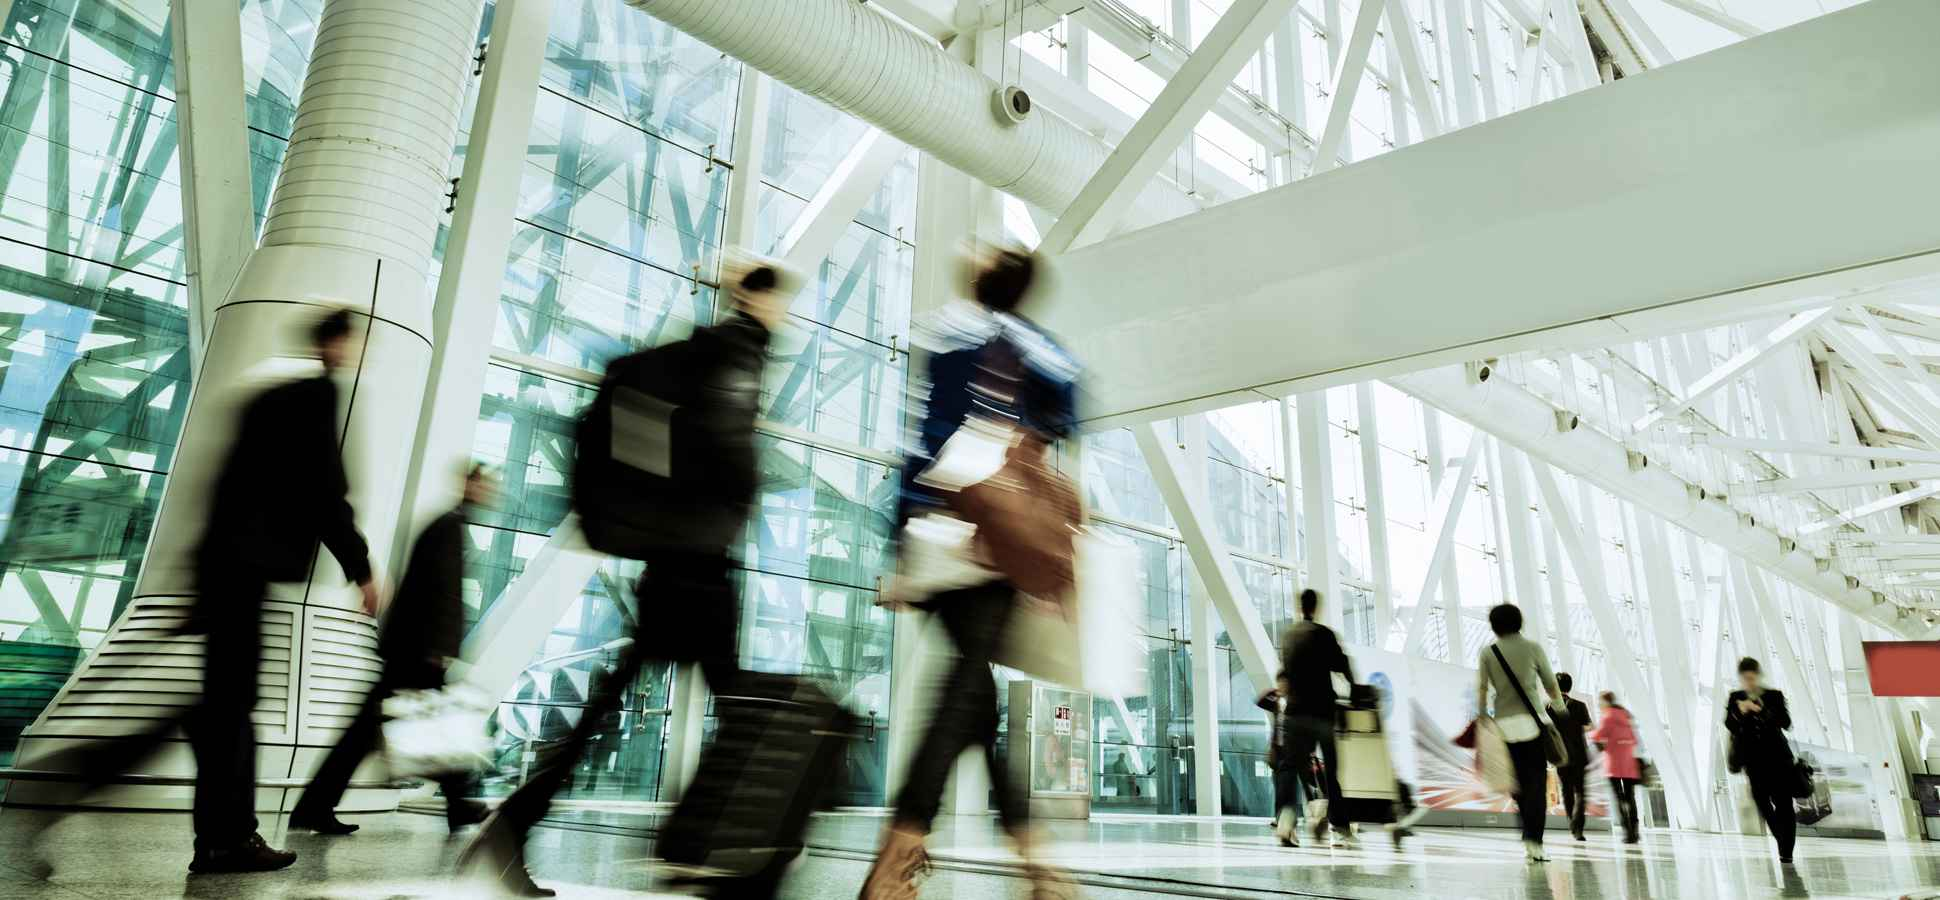 5 Hacks for the Busy Traveler